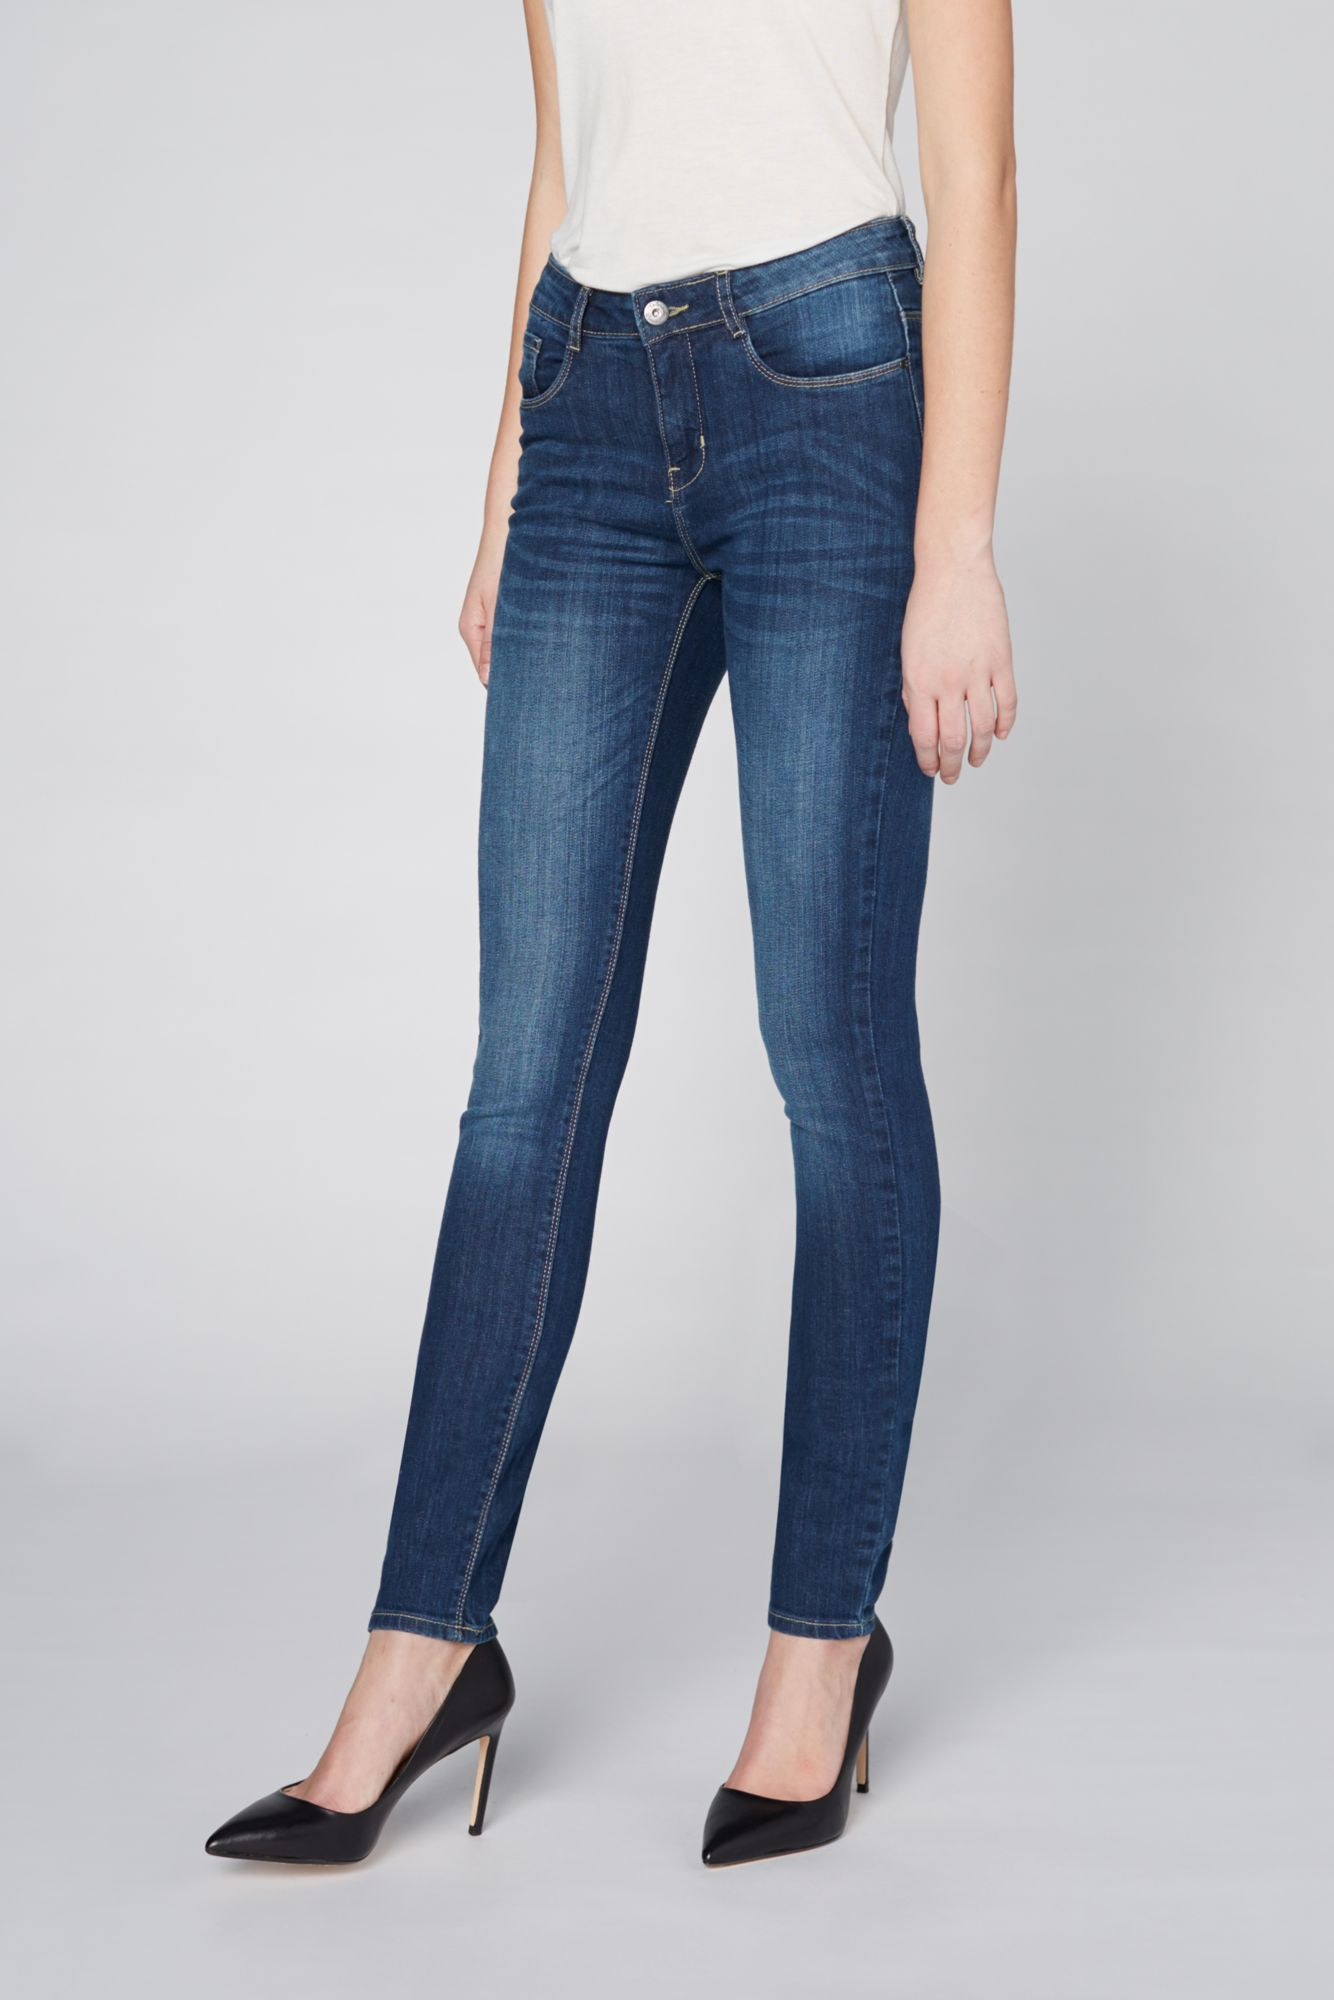 COLORADO DENIM  Jeans »C974 LANA Damen Jeans«